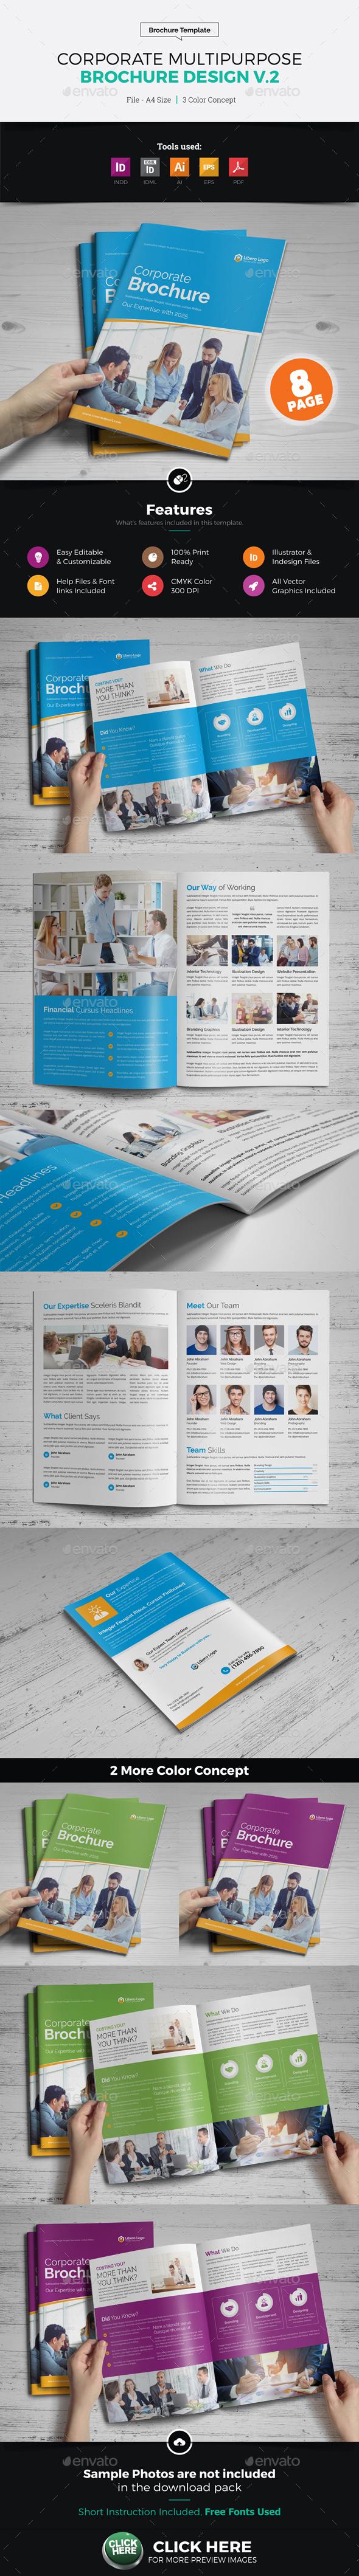 Corporate Multipurpose Brochure Design v2 - Corporate Brochures